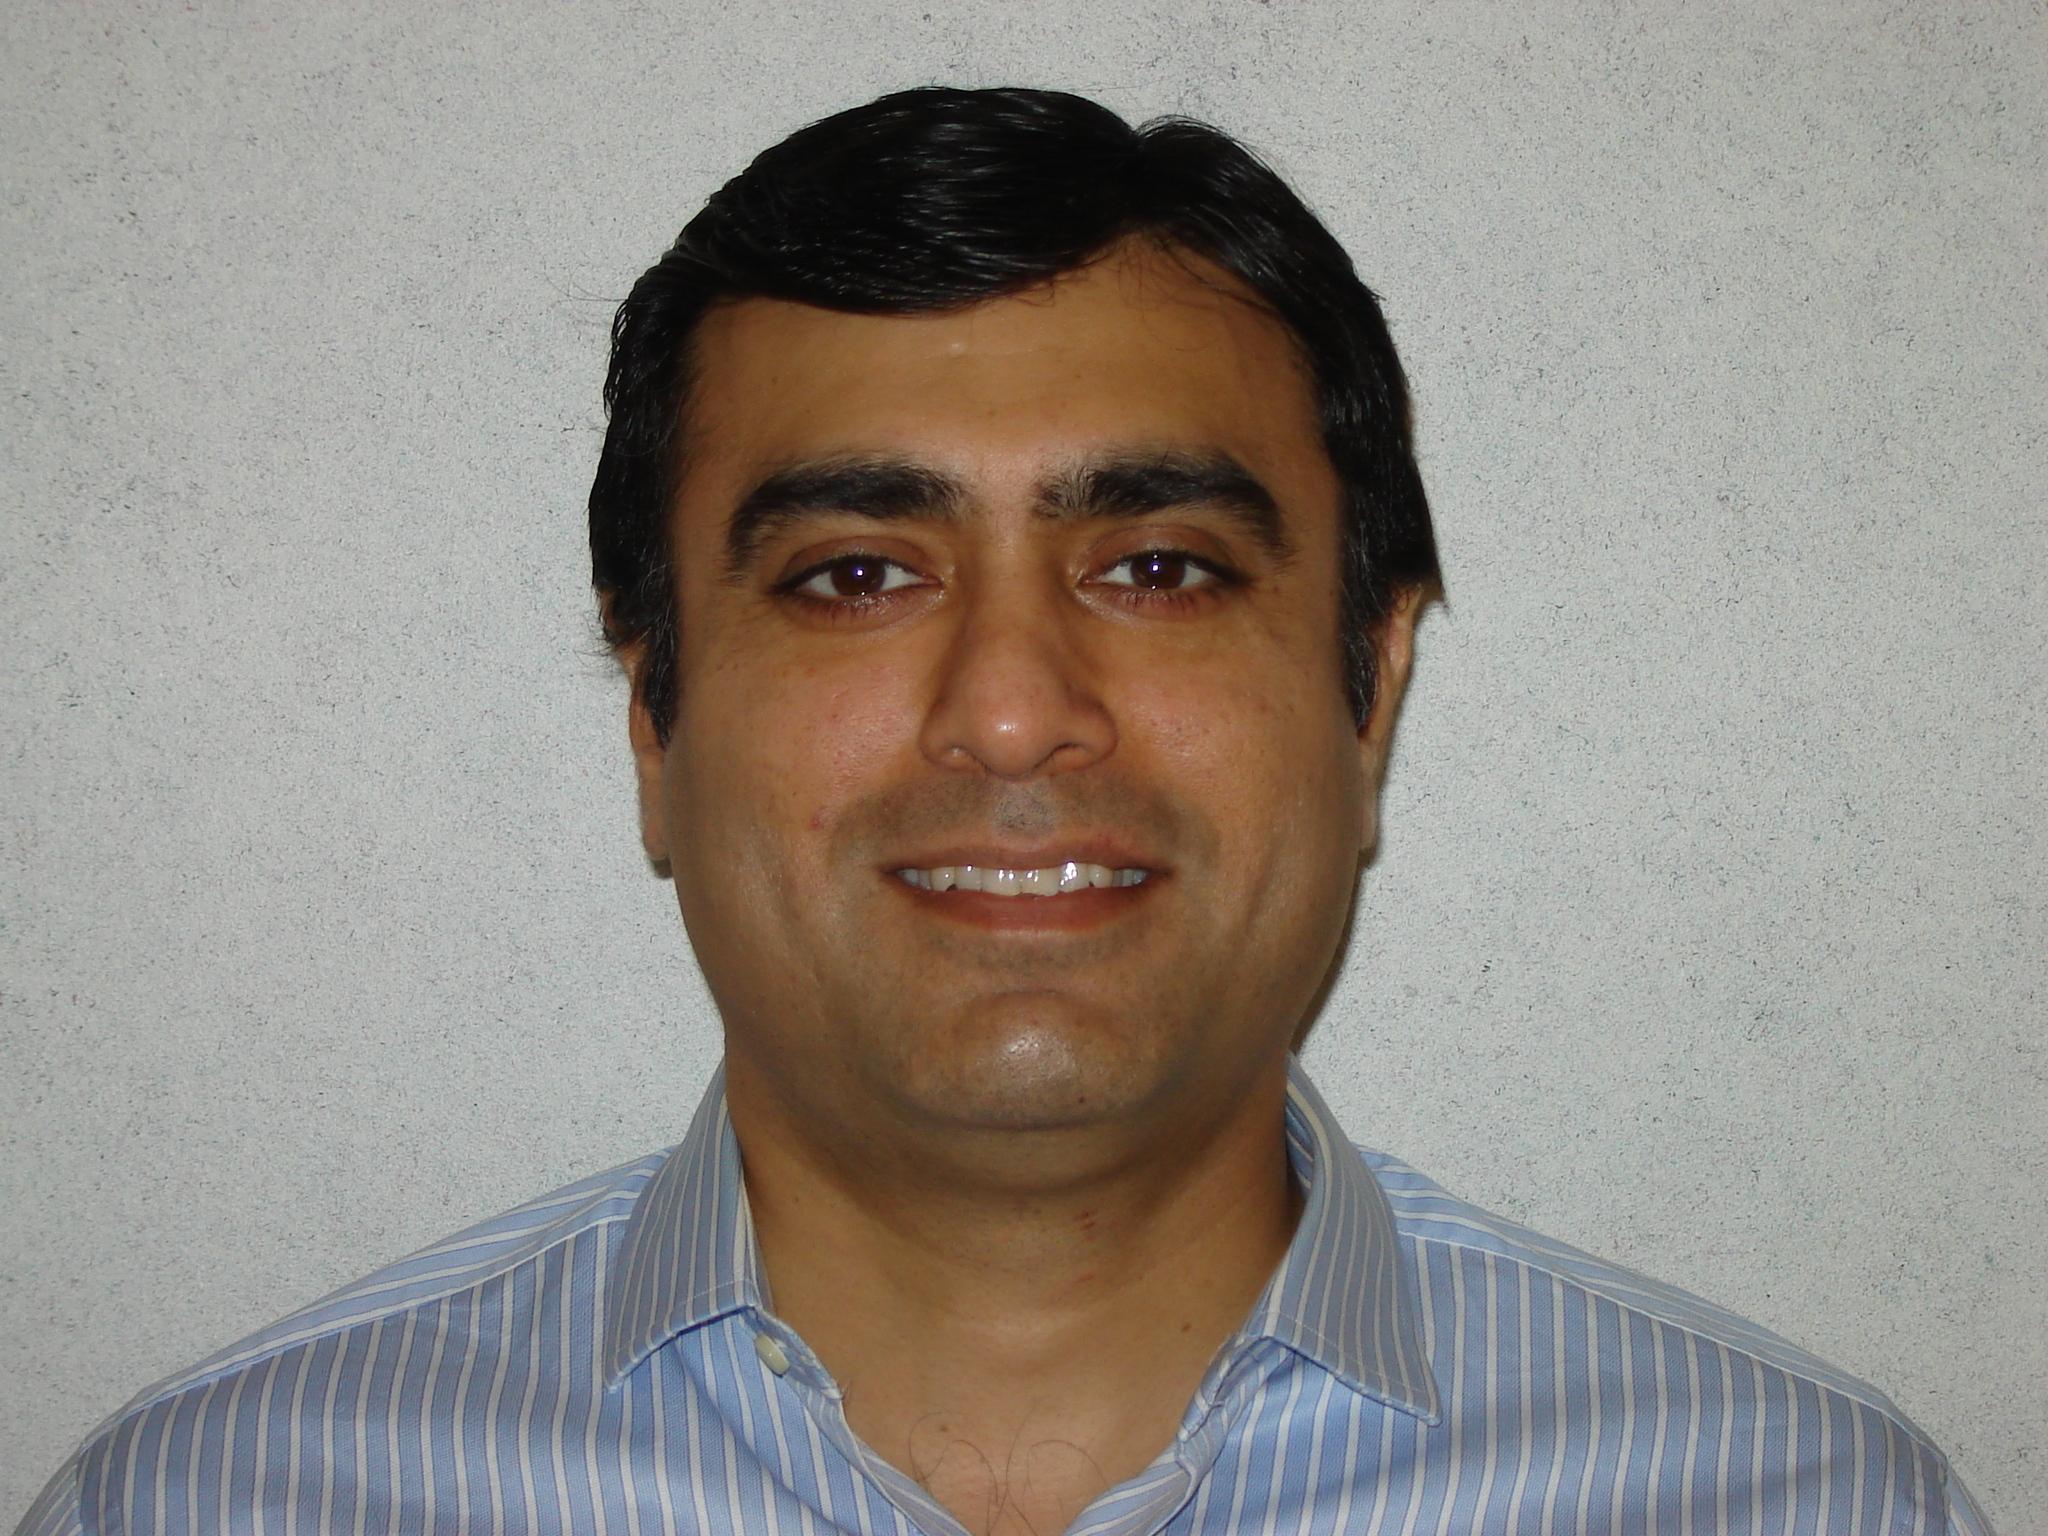 Irfan Asghar